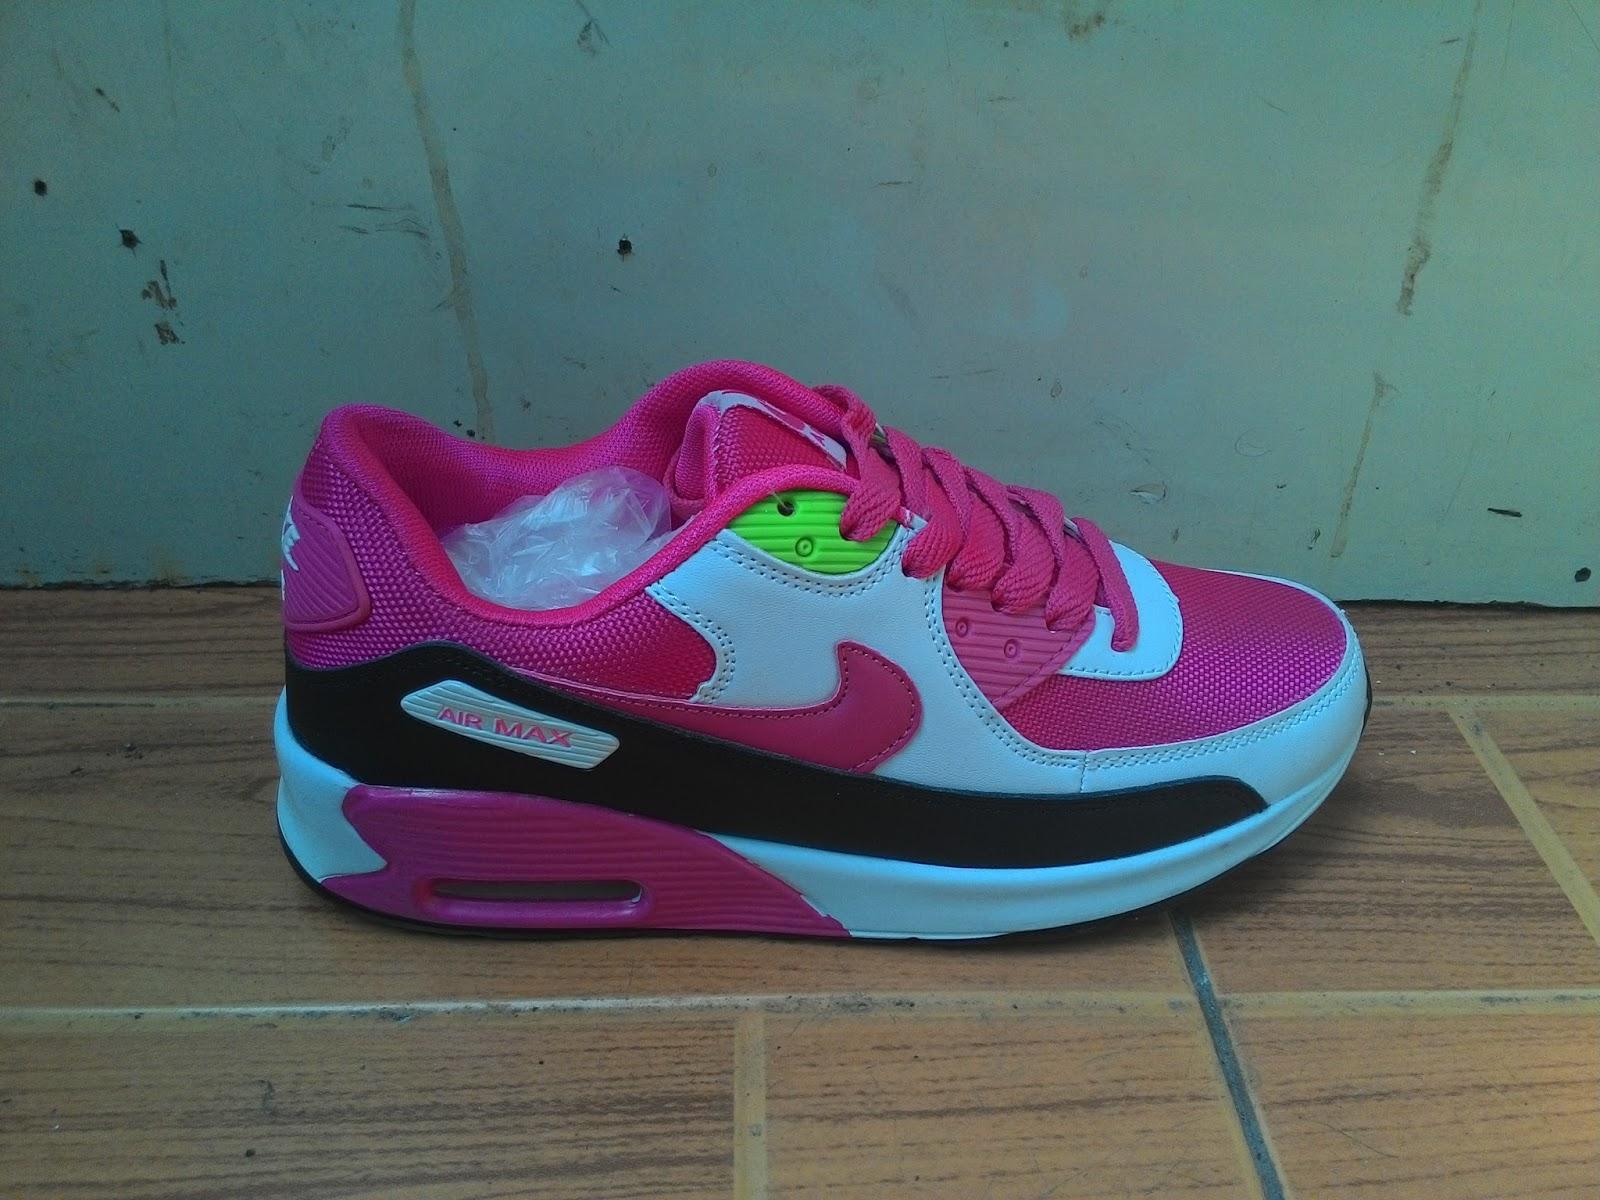 Sepatu Nike Airmax 90 Women   Toko Sepatu  13088ae2b5